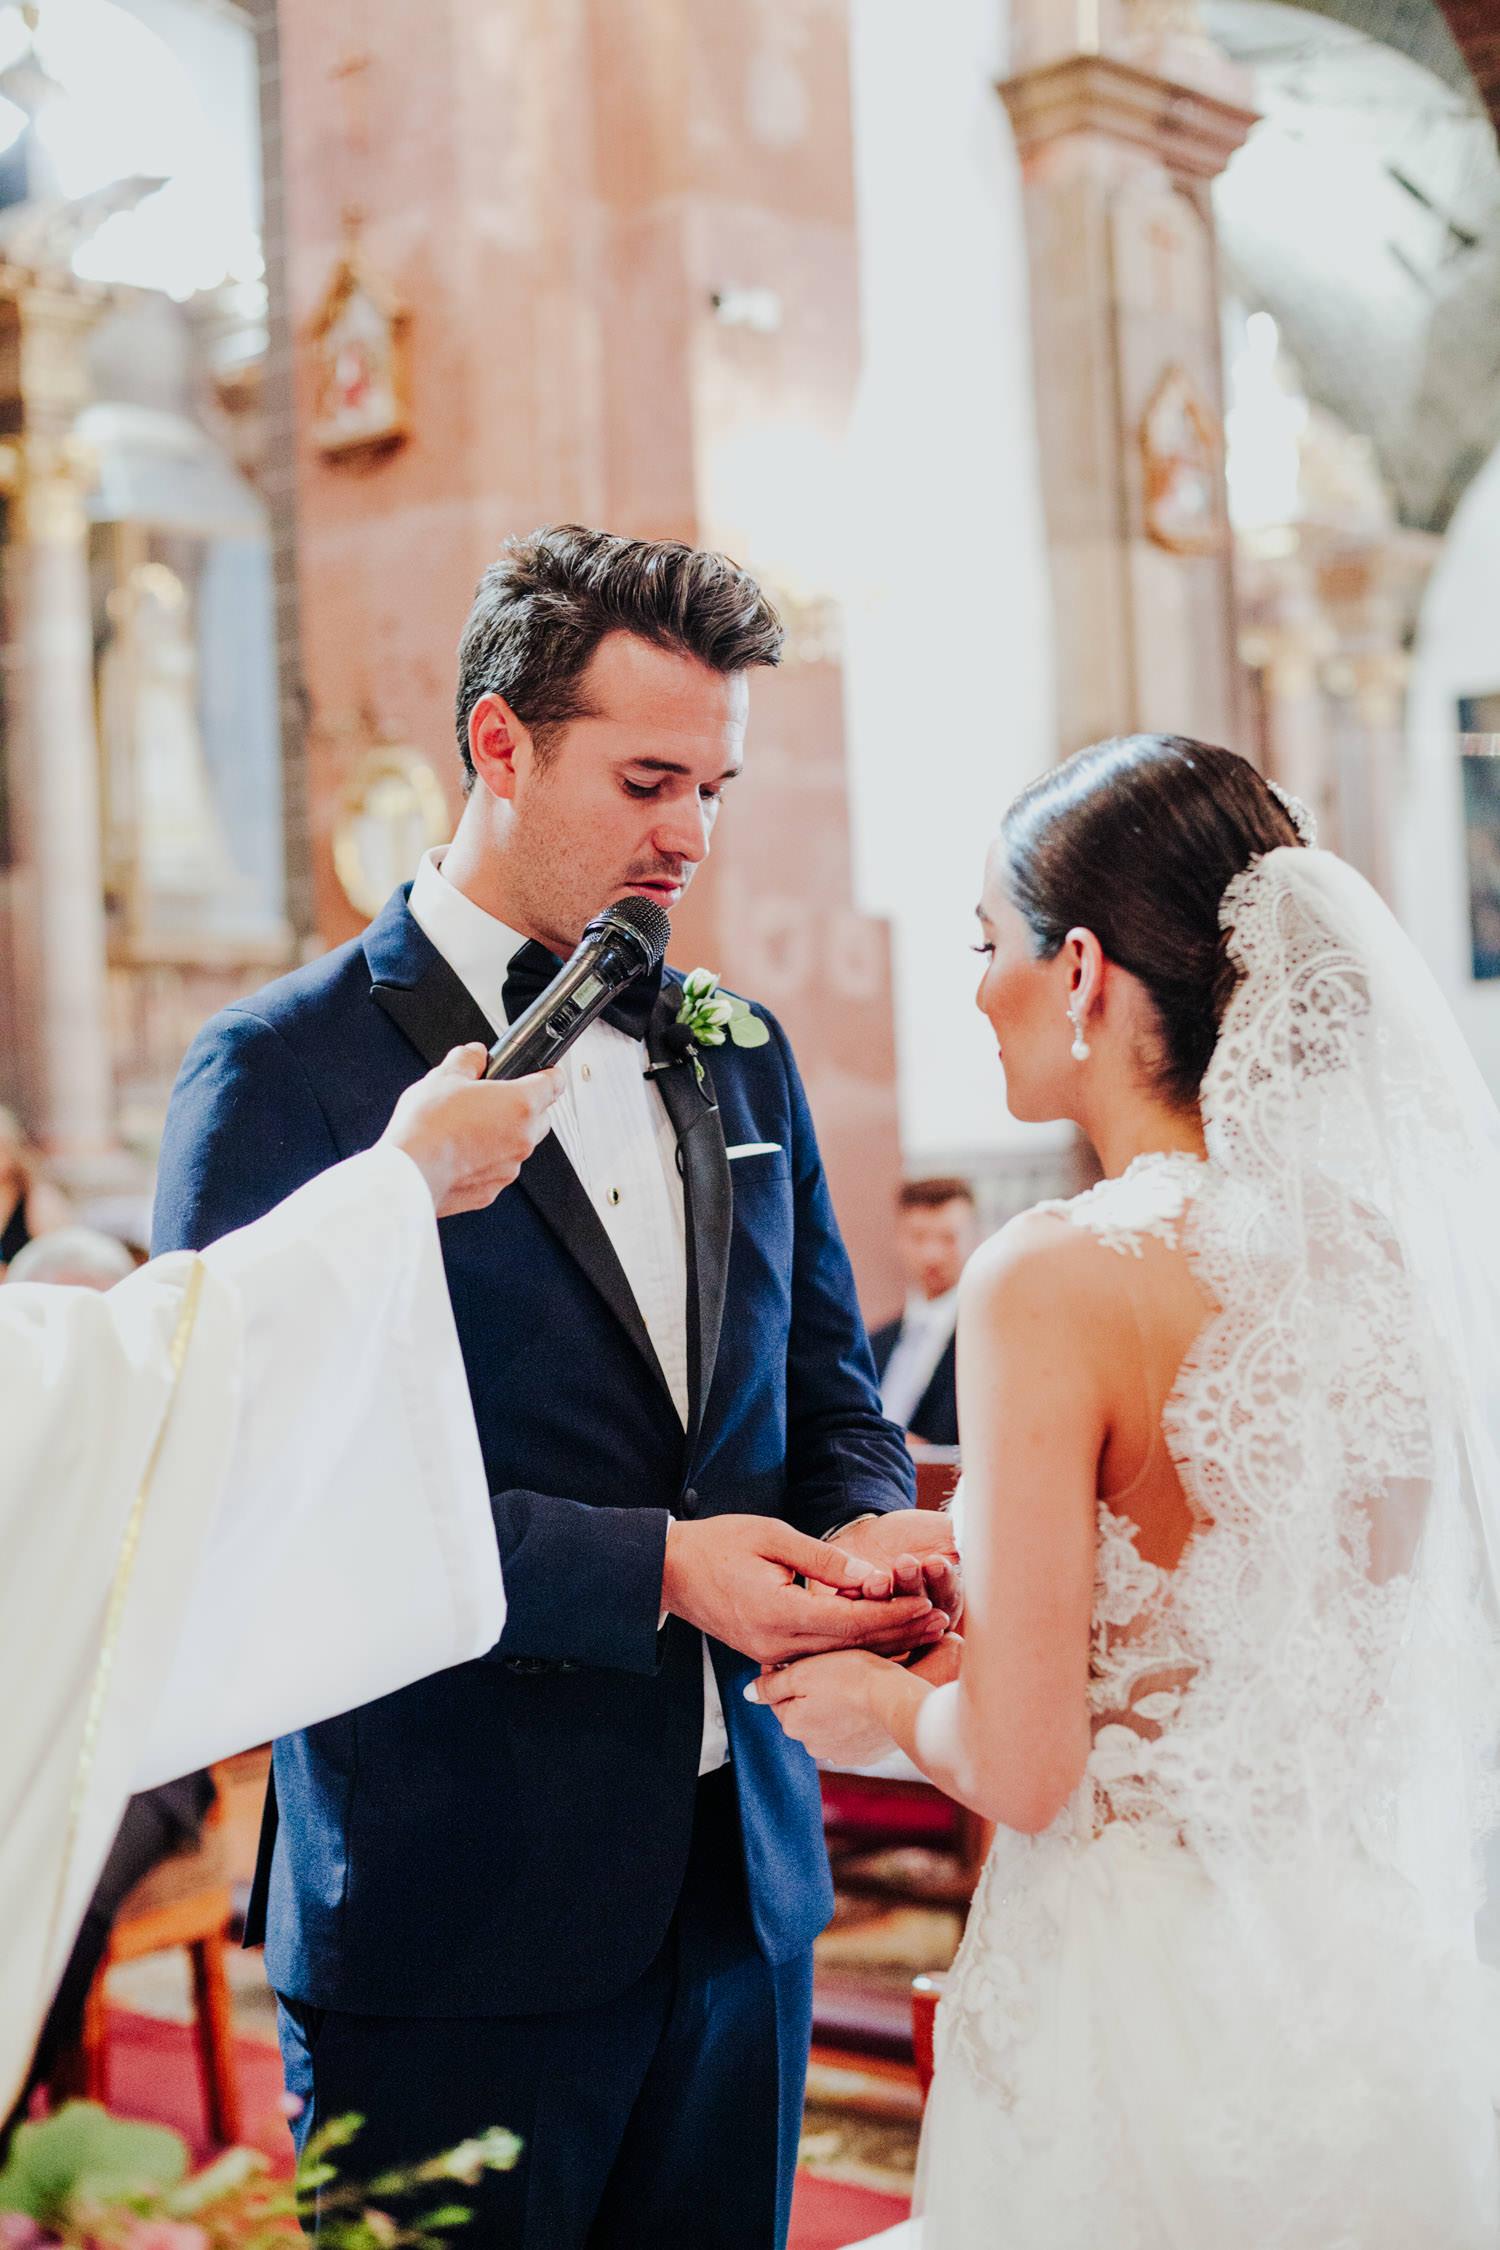 San-Miguel-de-Allende-Wedding-Photography-Parroquia-Instituto-Boda-Fotografia-Fer-Sergio-Pierce-Lifestyle-Photography0158.JPG